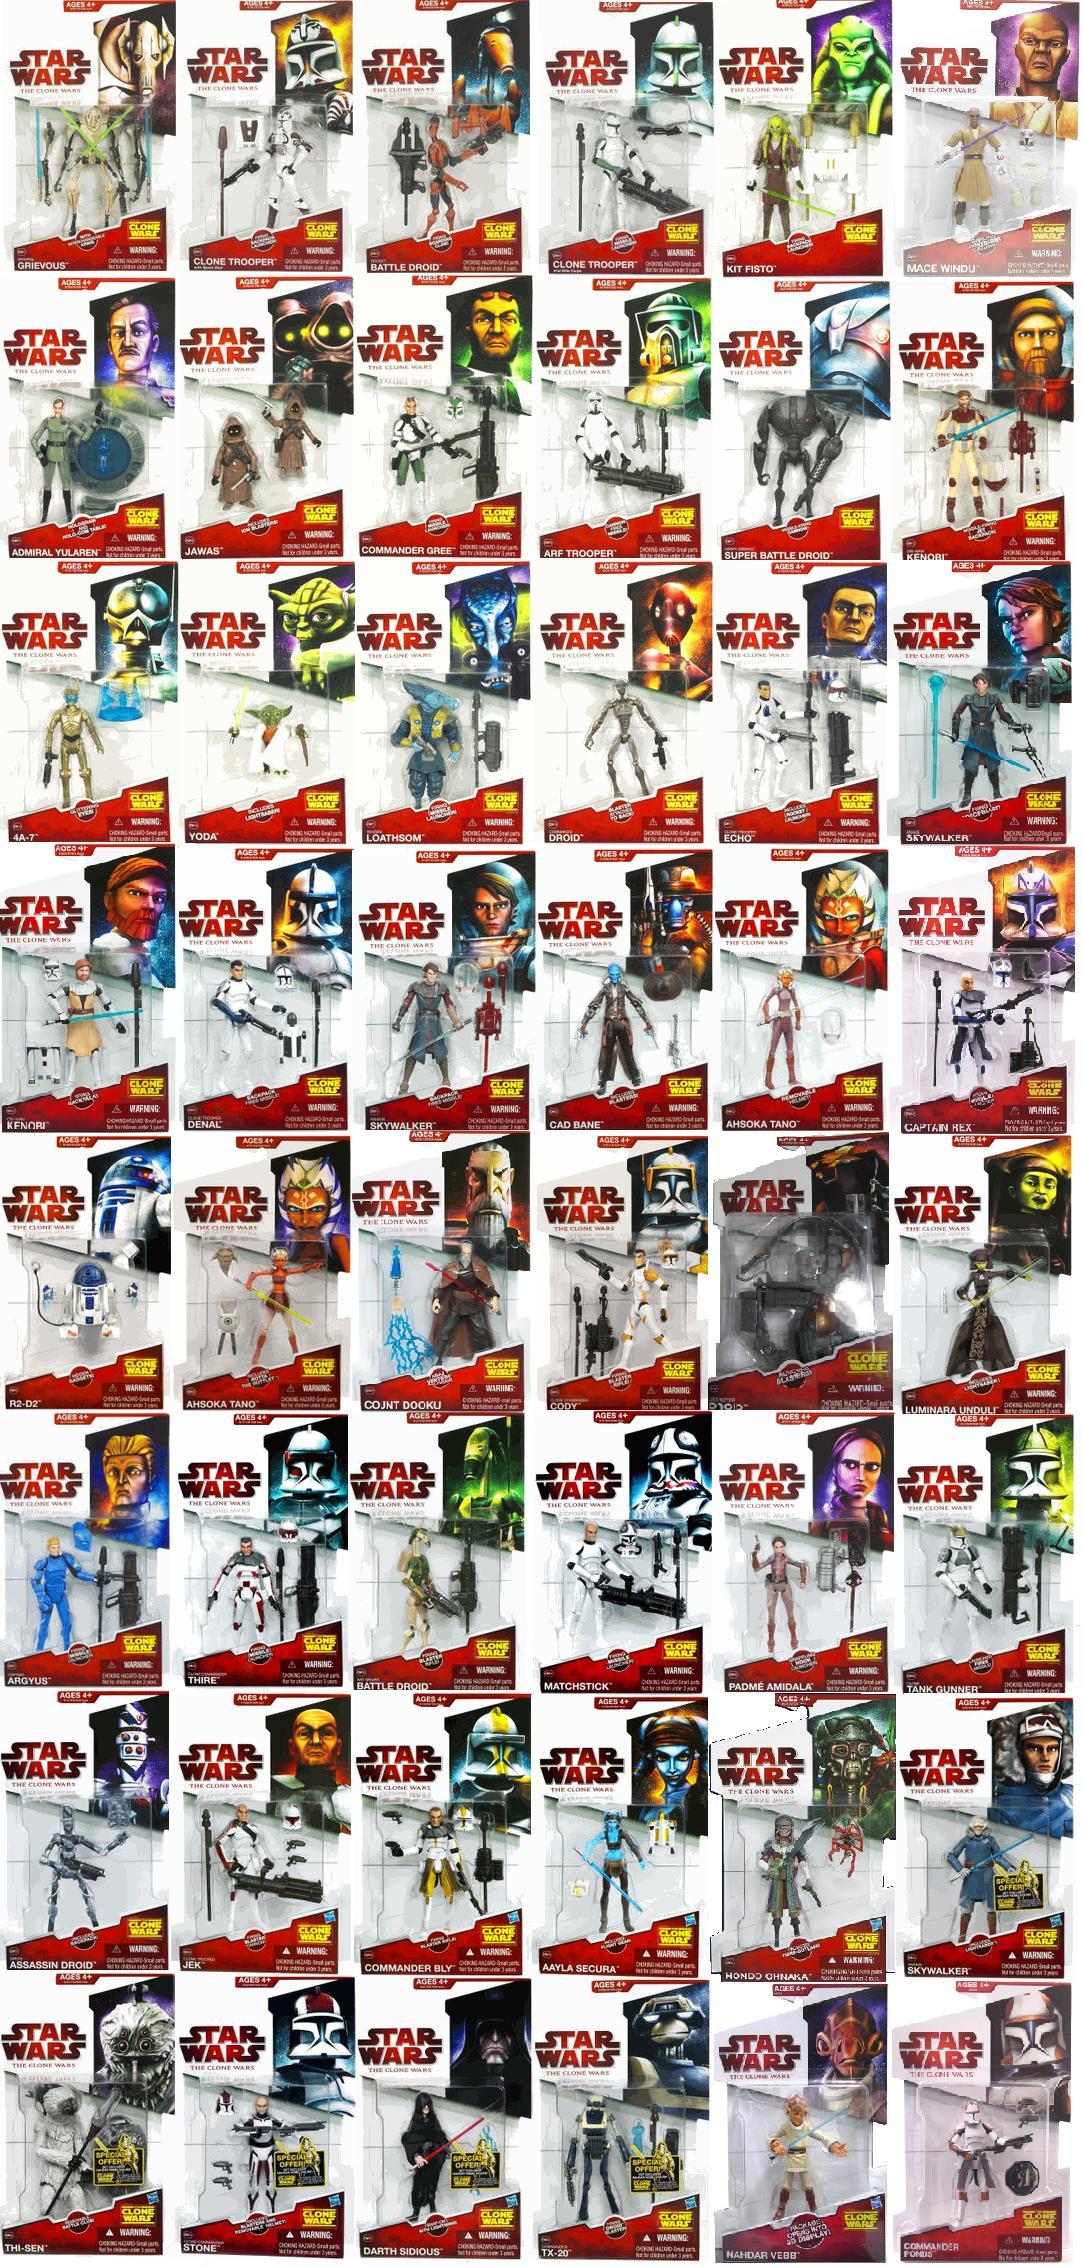 Star wars the clone wars toy line wookieepedia the star wars